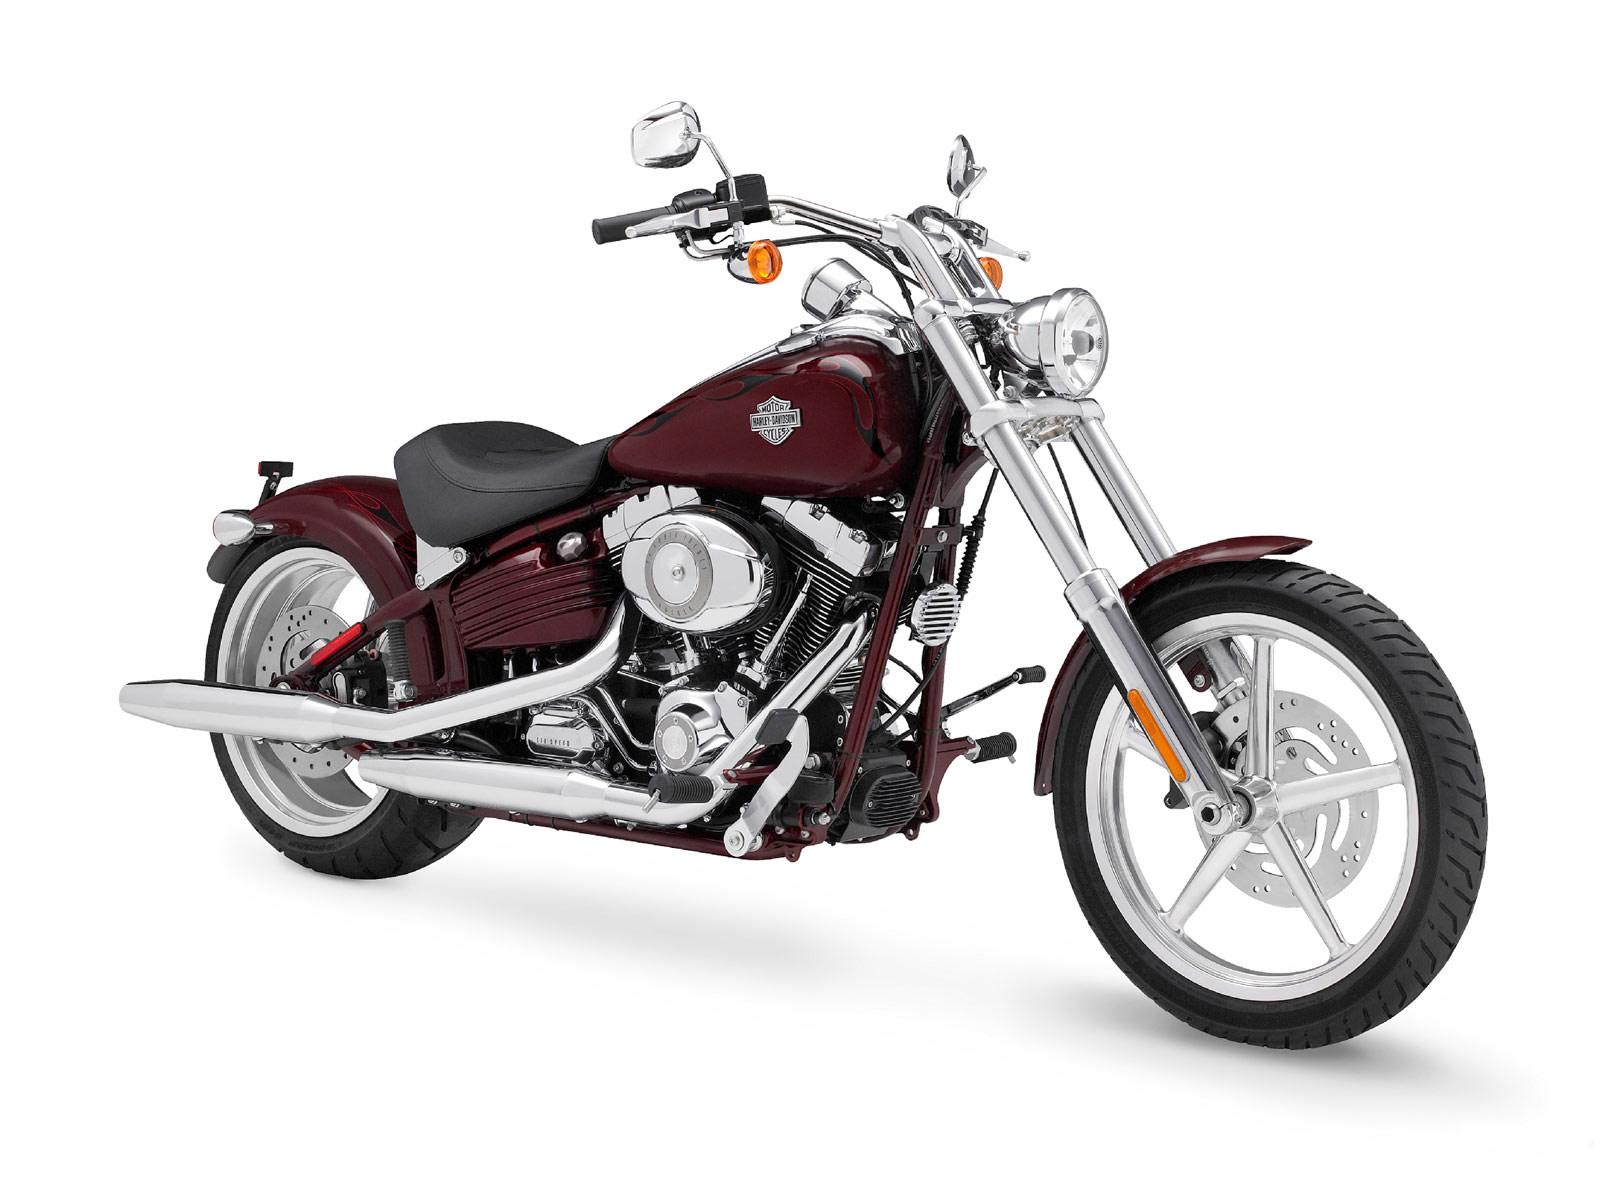 Harley Davidson FXCWC Rocker C Modifikasi Dan Spesifikasi Motor